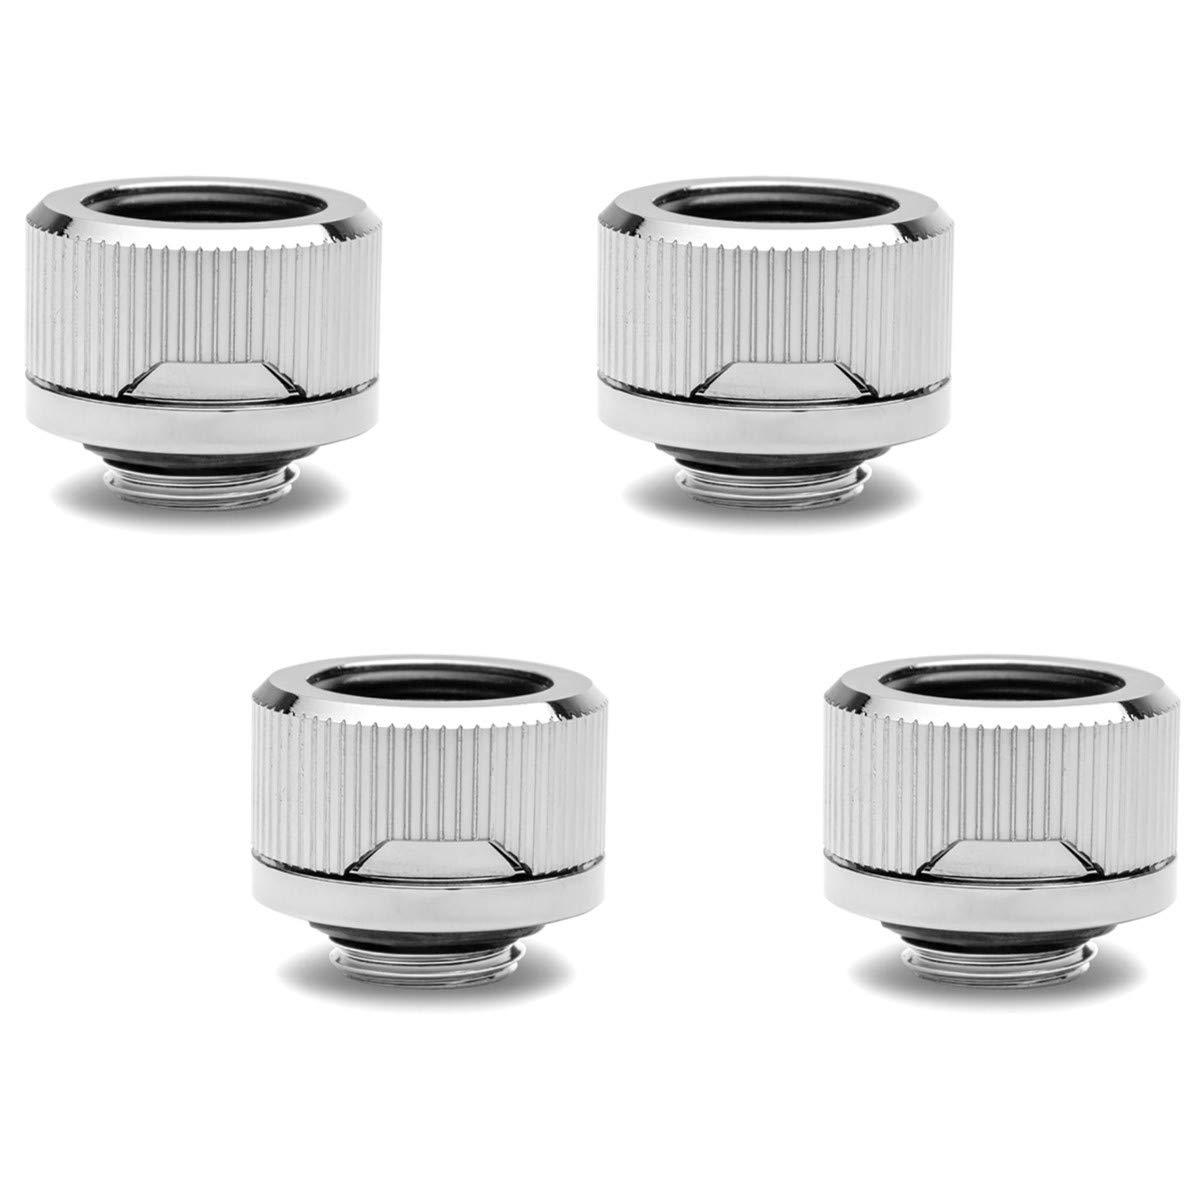 EKWB EK-Torque HTC-16 Compression Fitting for EKWB Rigid Tubing, 16mm OD, Nickel, 4-Pack